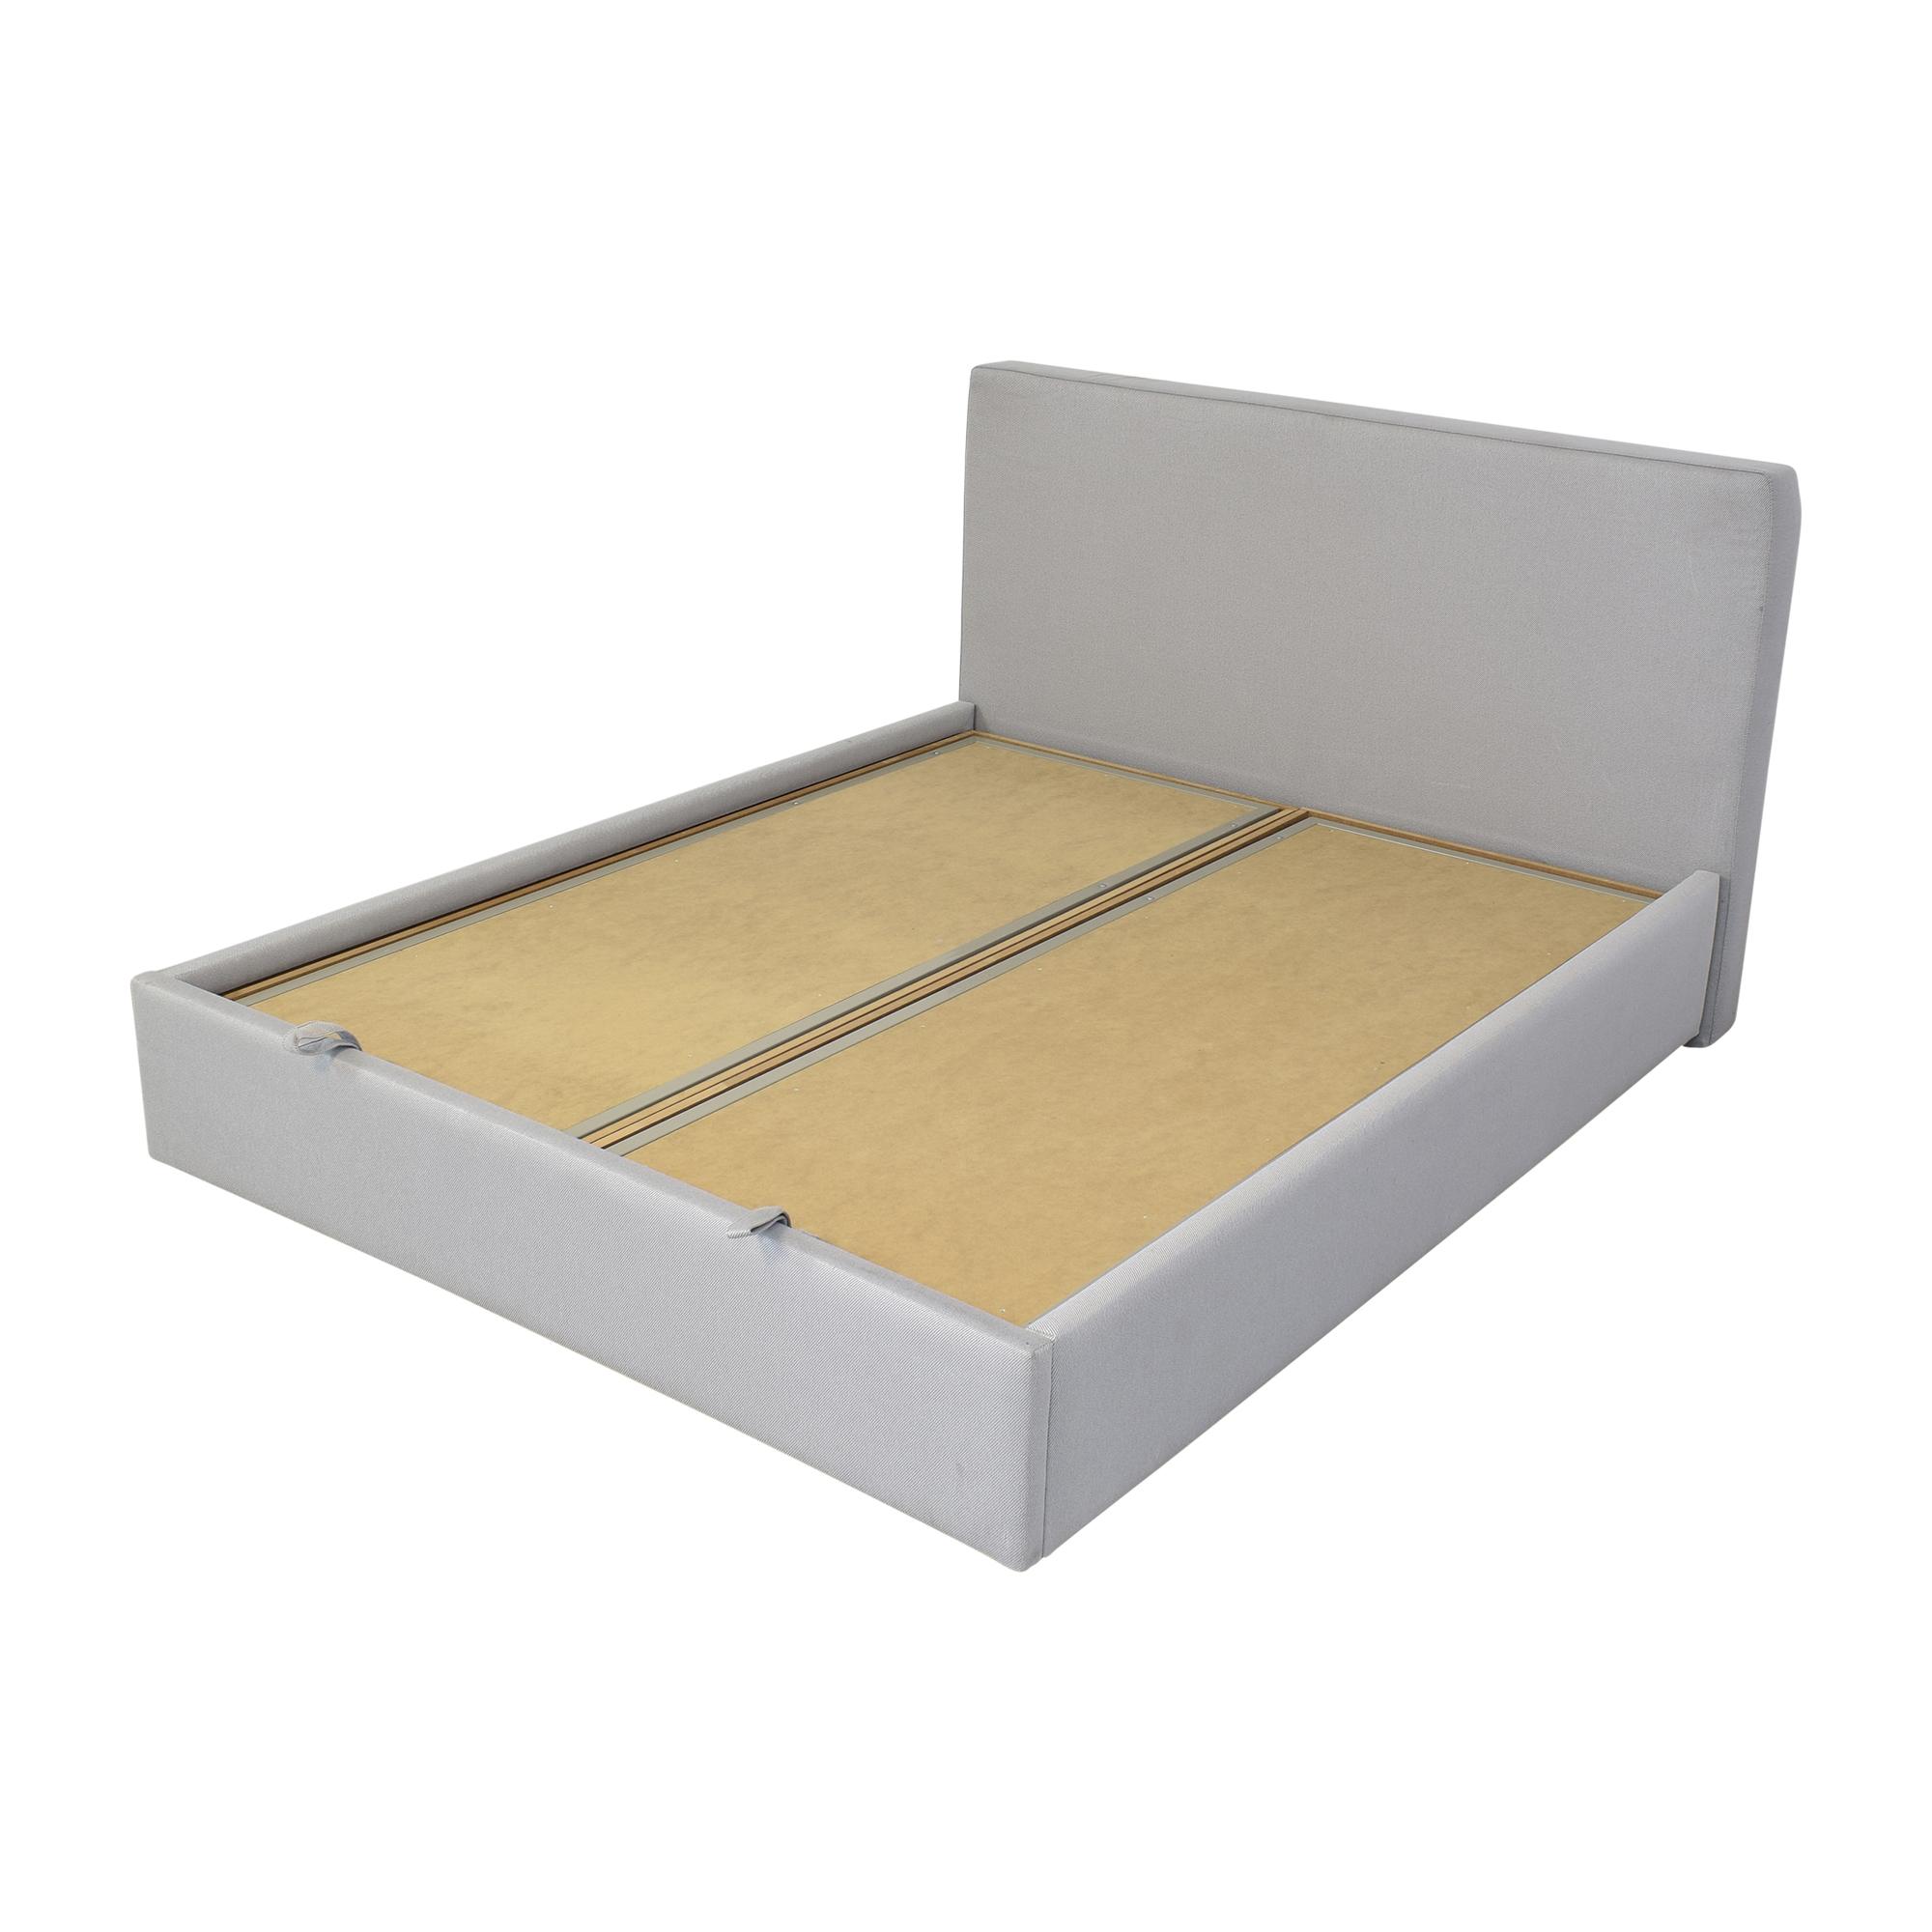 Upholstered Storage Queen Bed